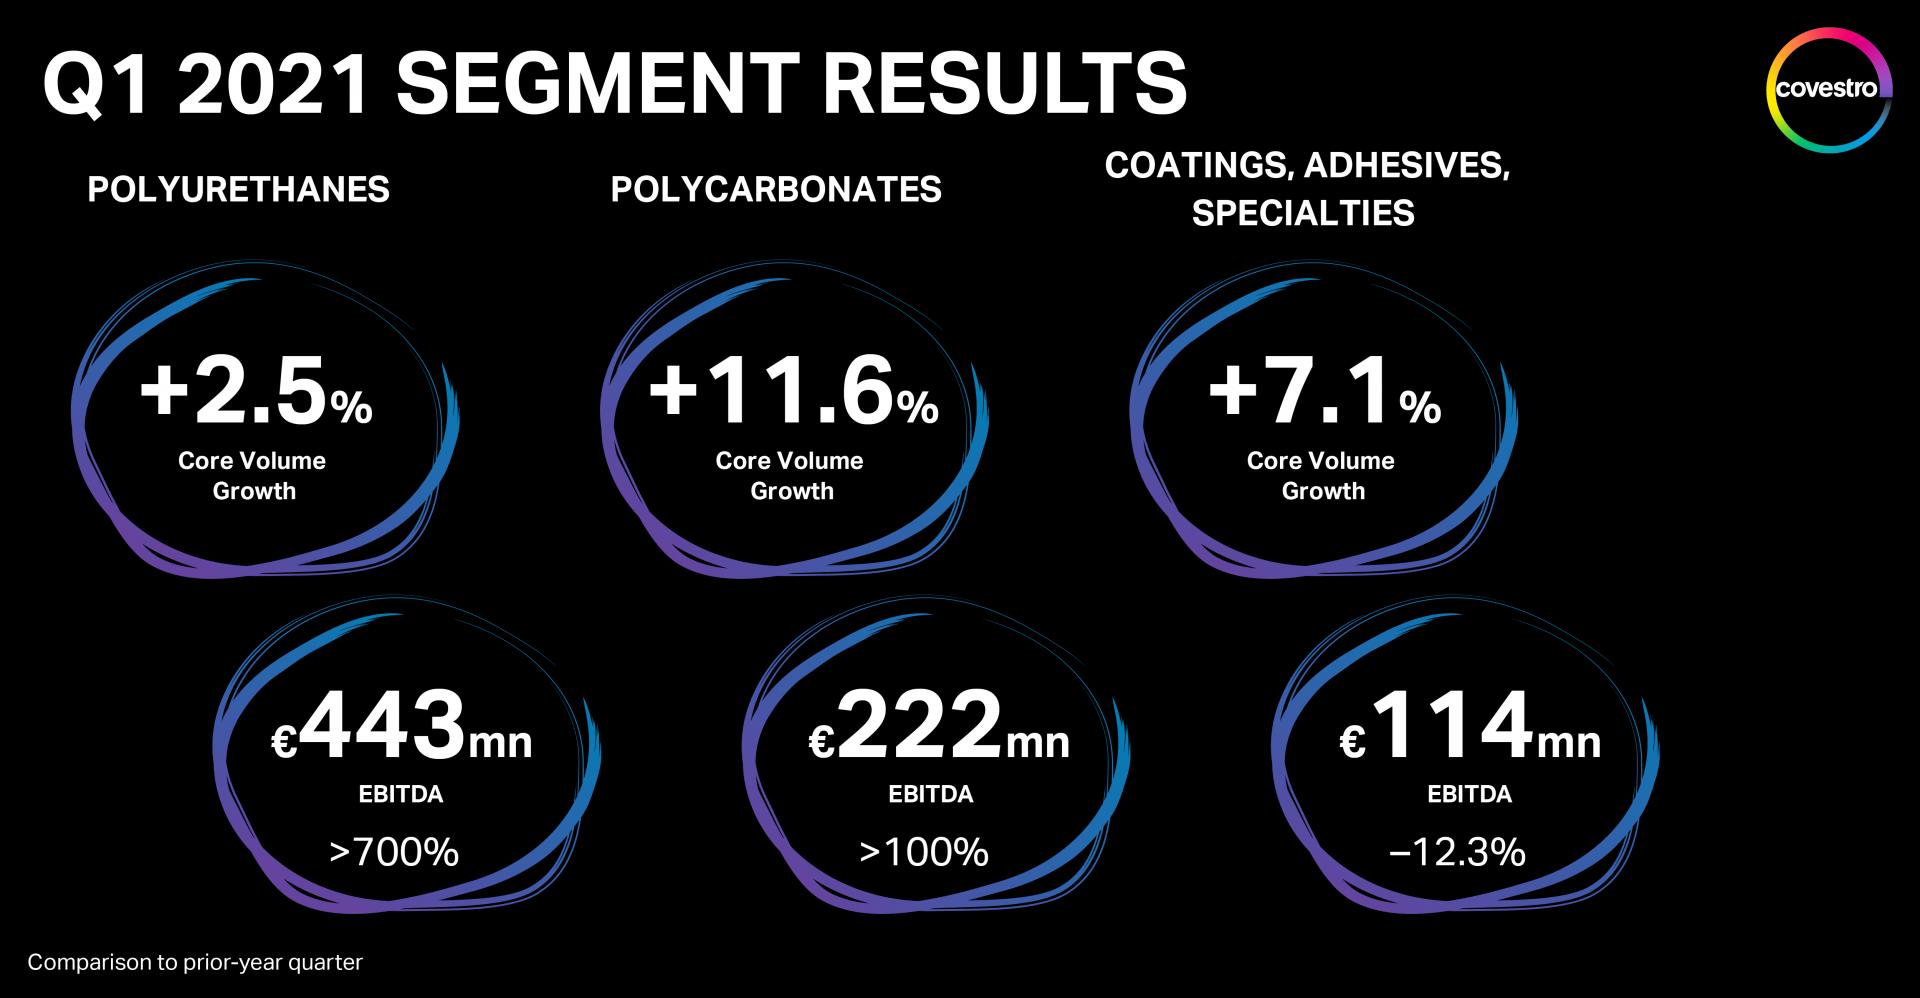 nxr_covestro_q121_segment-results_en